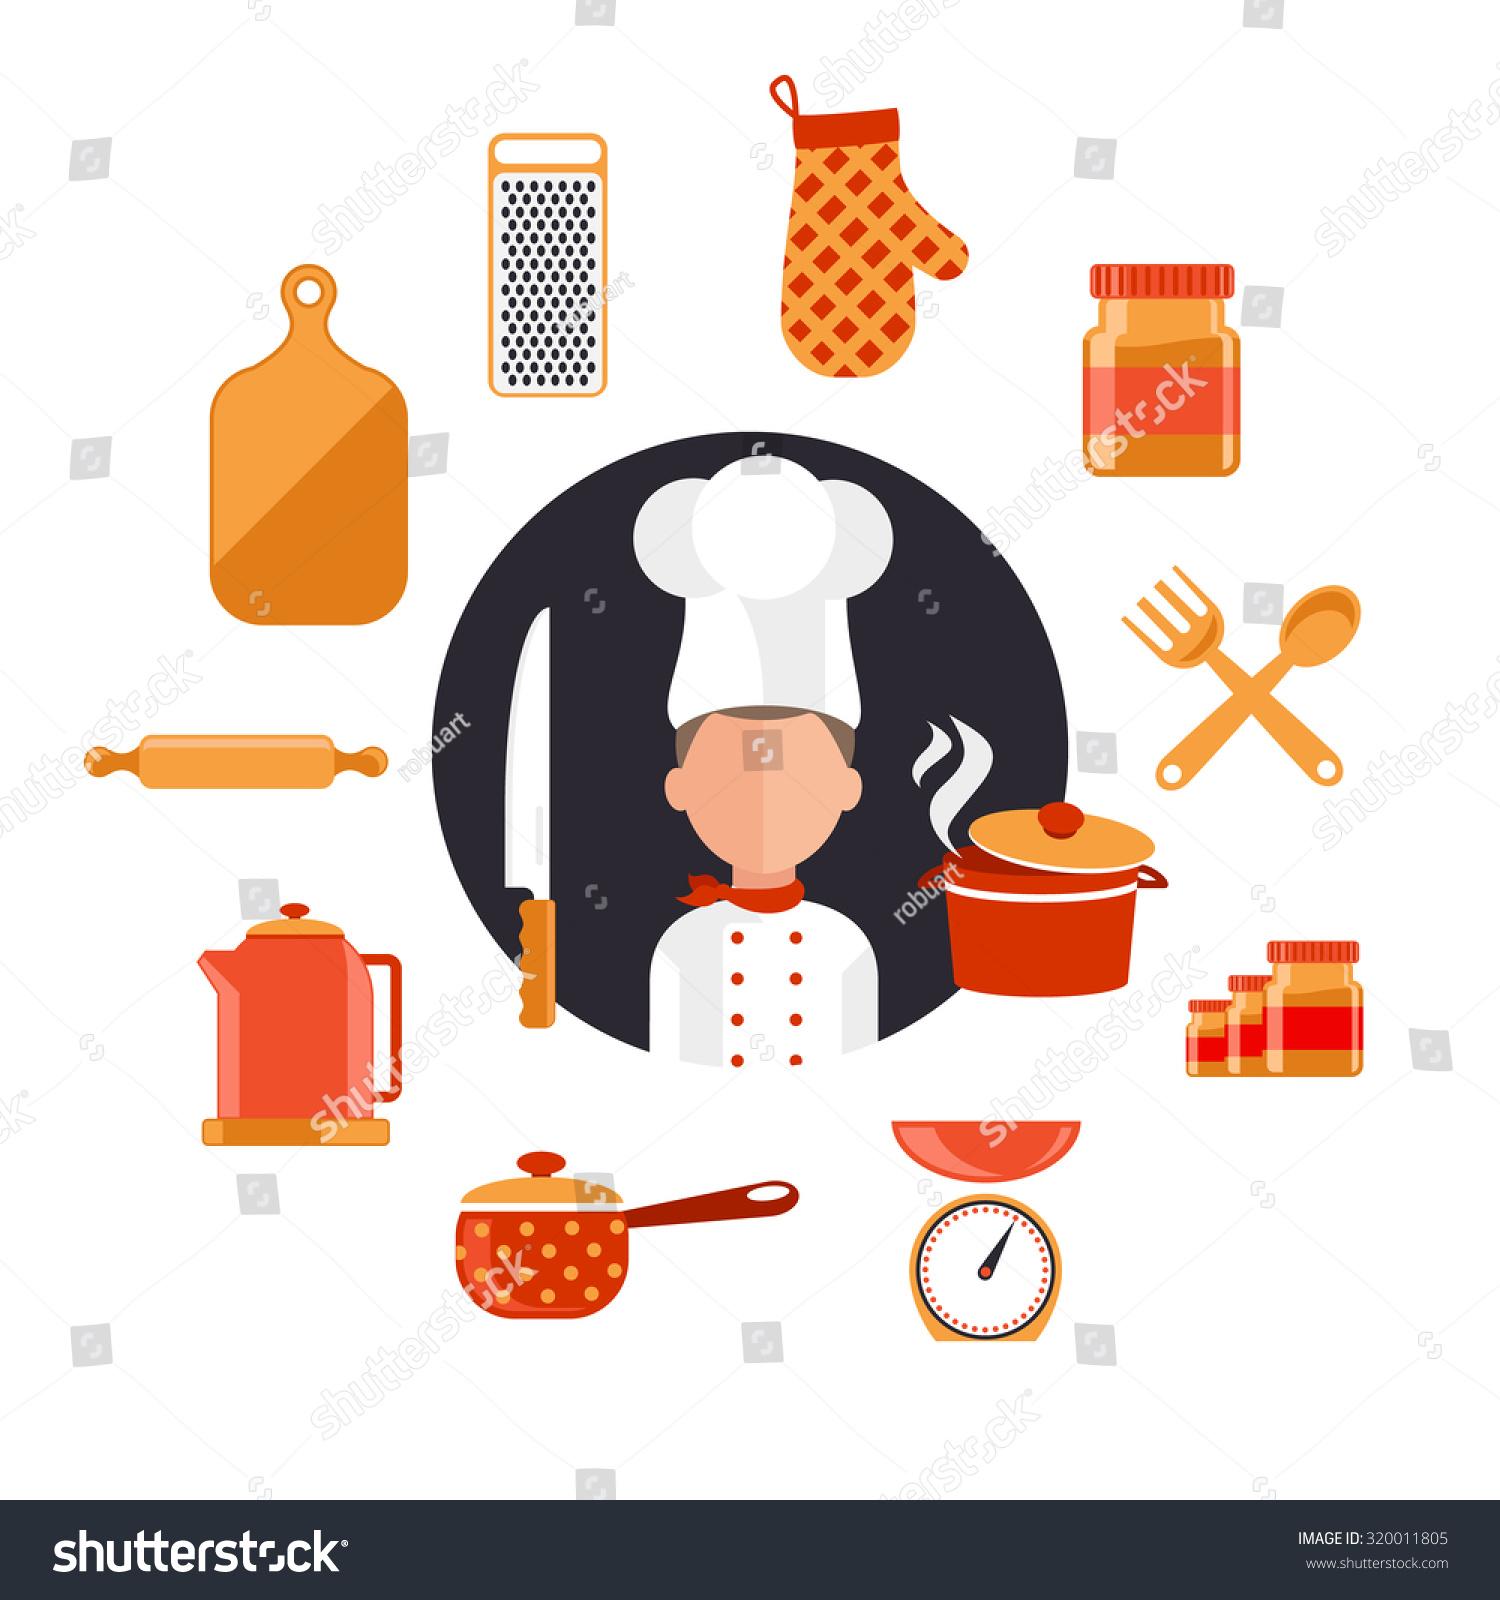 flat design icons kitchen utensils chef stock illustration